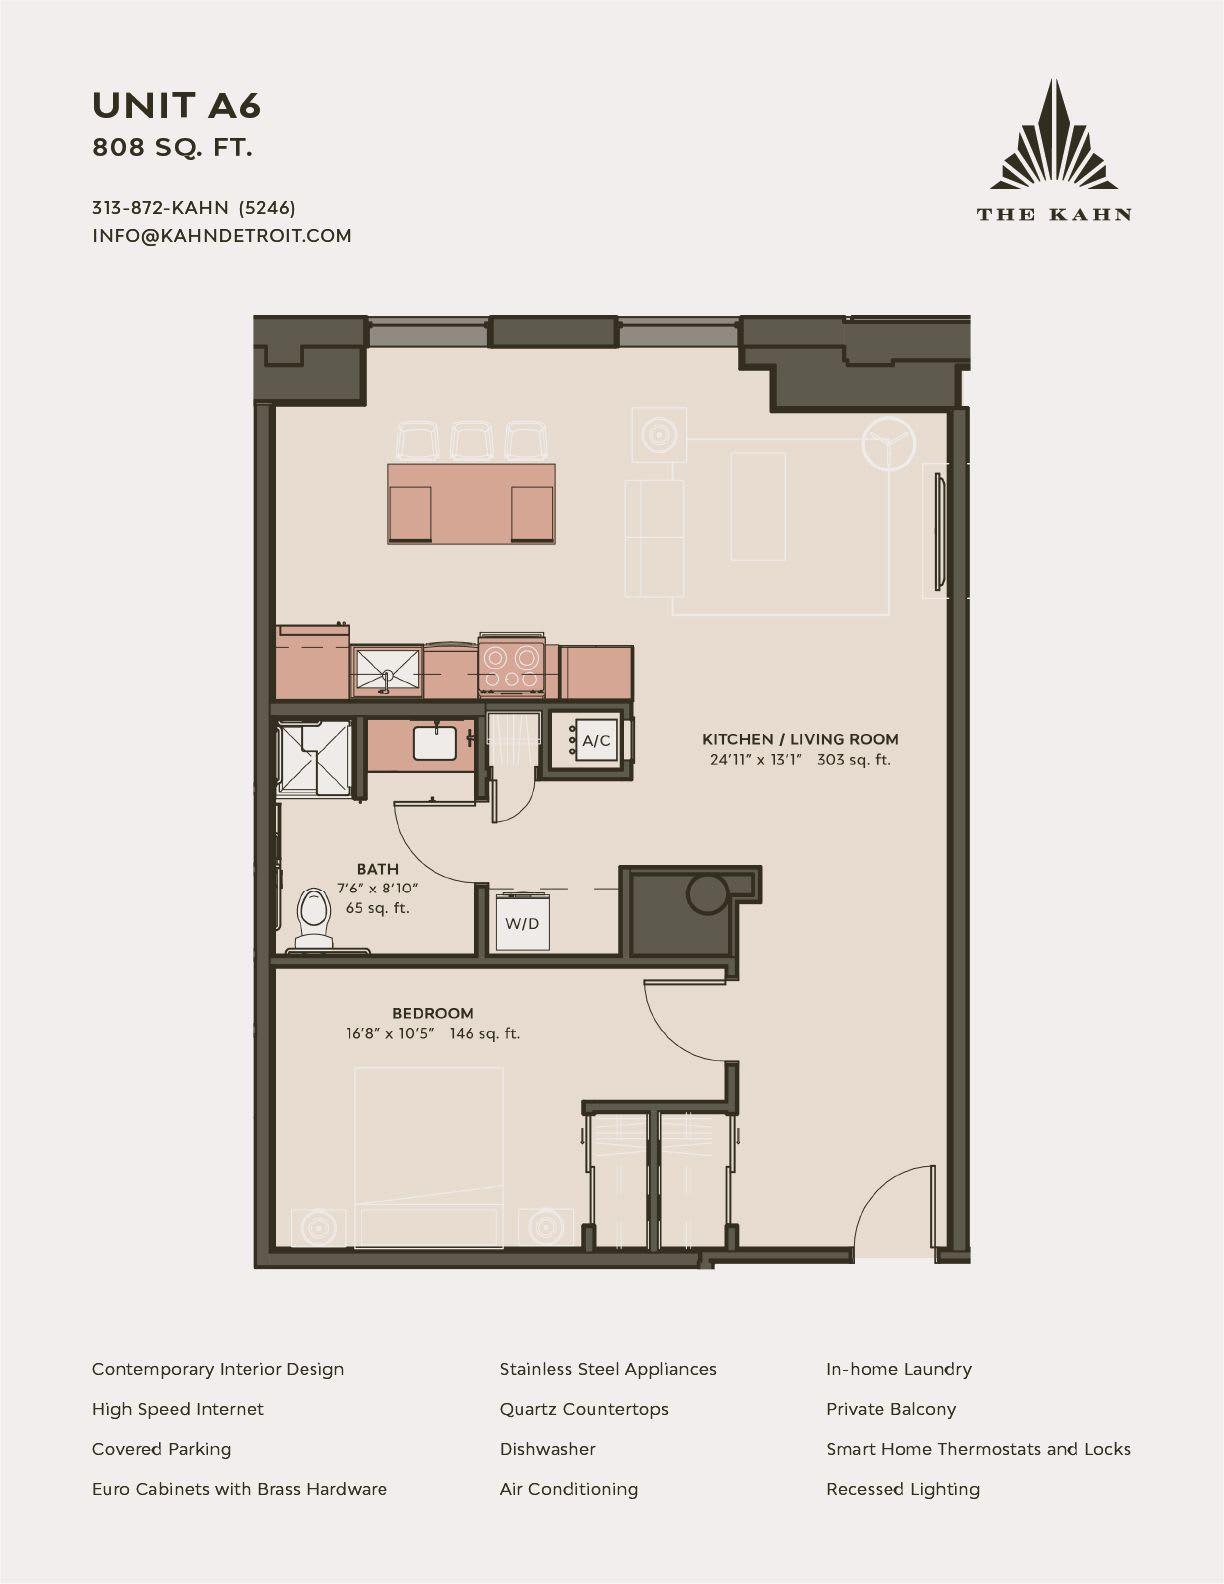 A6 floor plan image